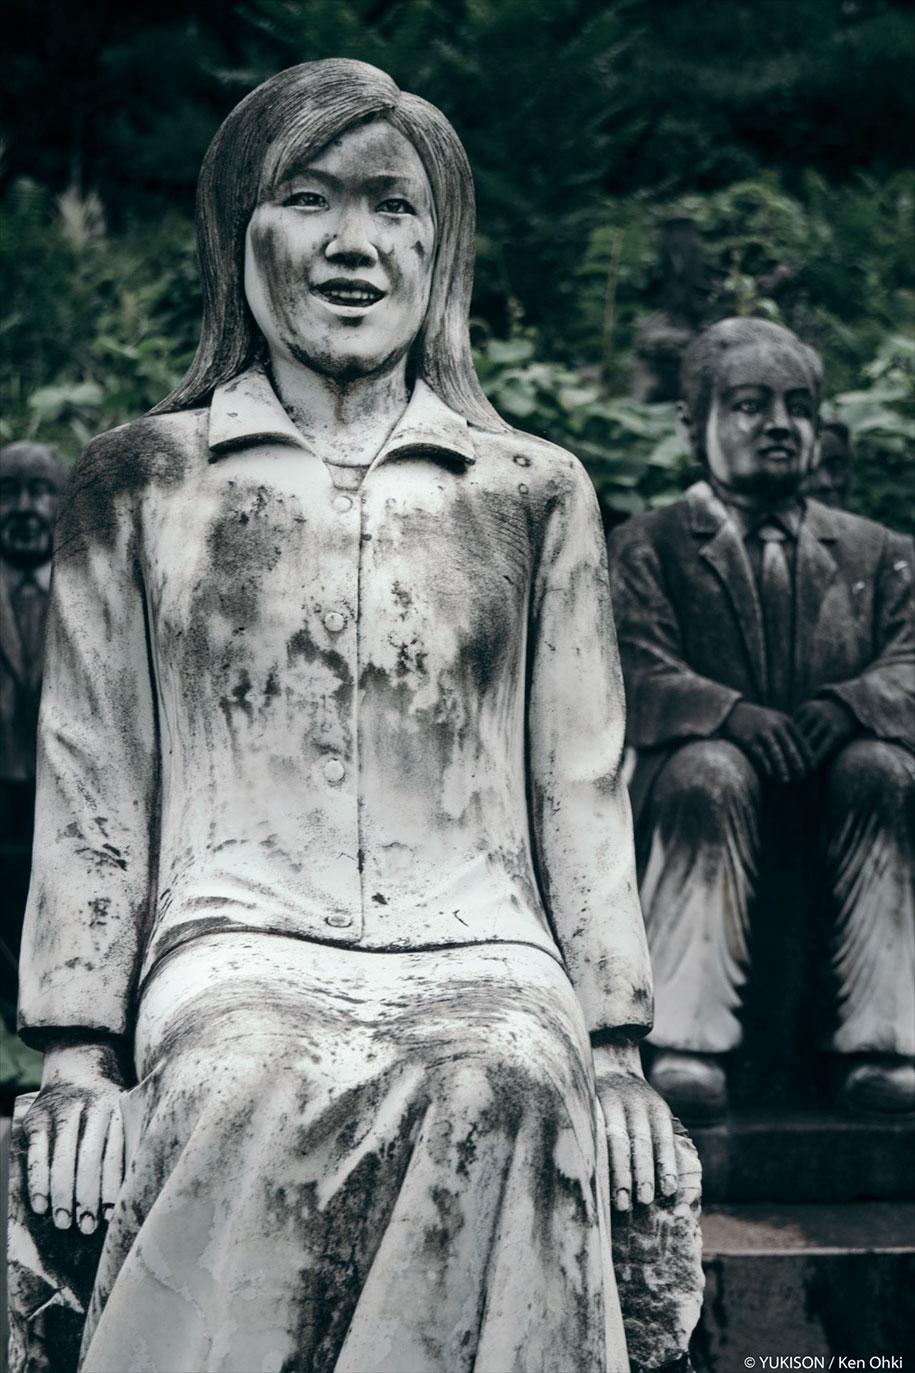 creepy-statues-forbidden-forest-japan-yukisons-ken-ohki-17